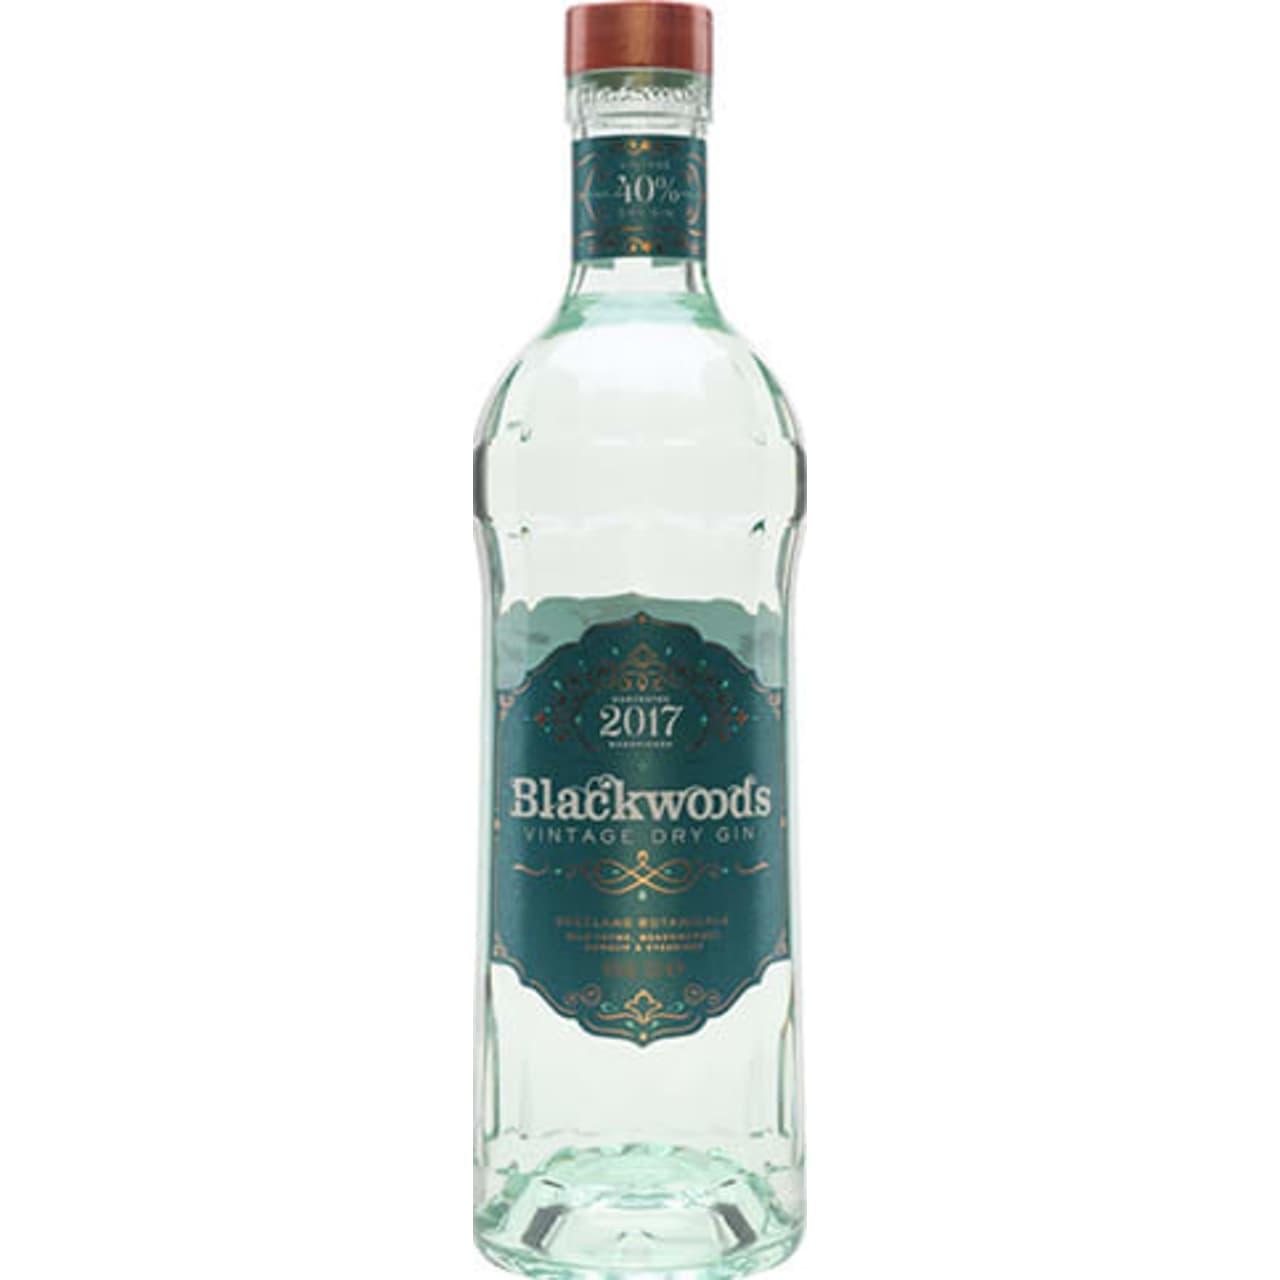 Product Image - Blackwoods Vintage Dry Gin